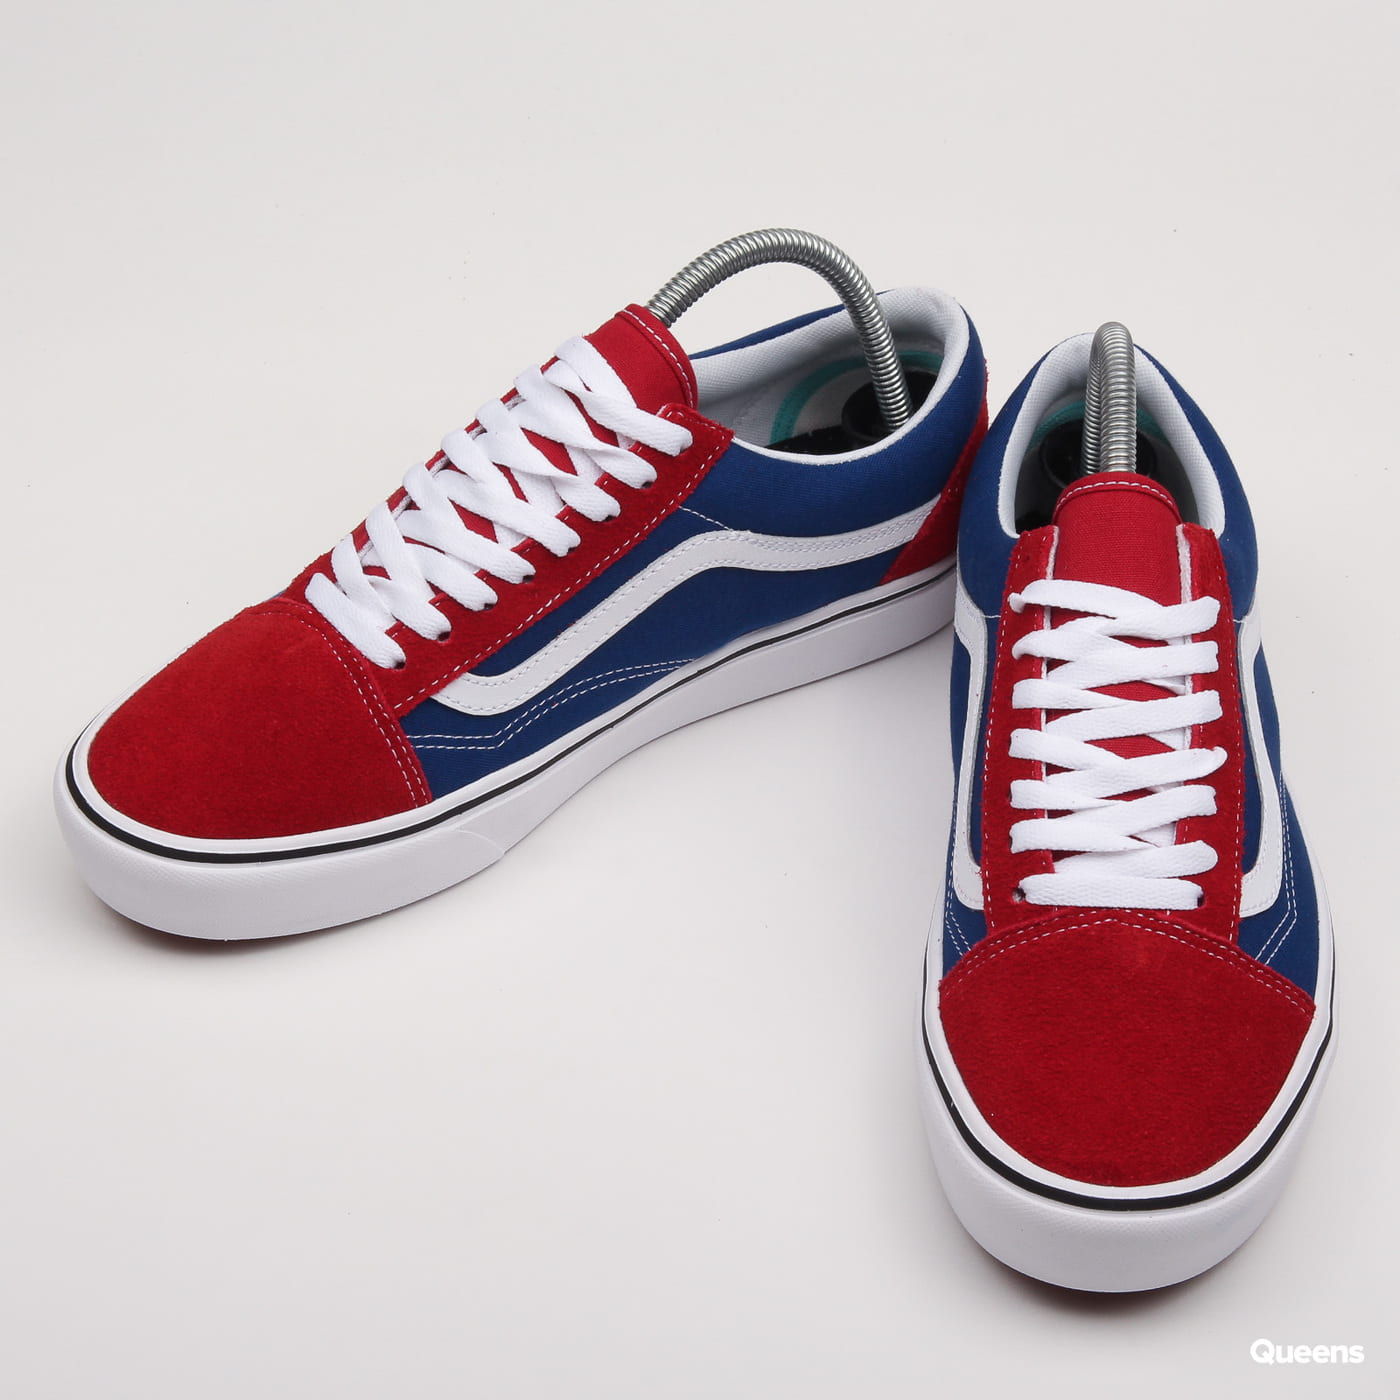 Vans ComfyCush Old Skool (two-tone) chilli pepper / true blue